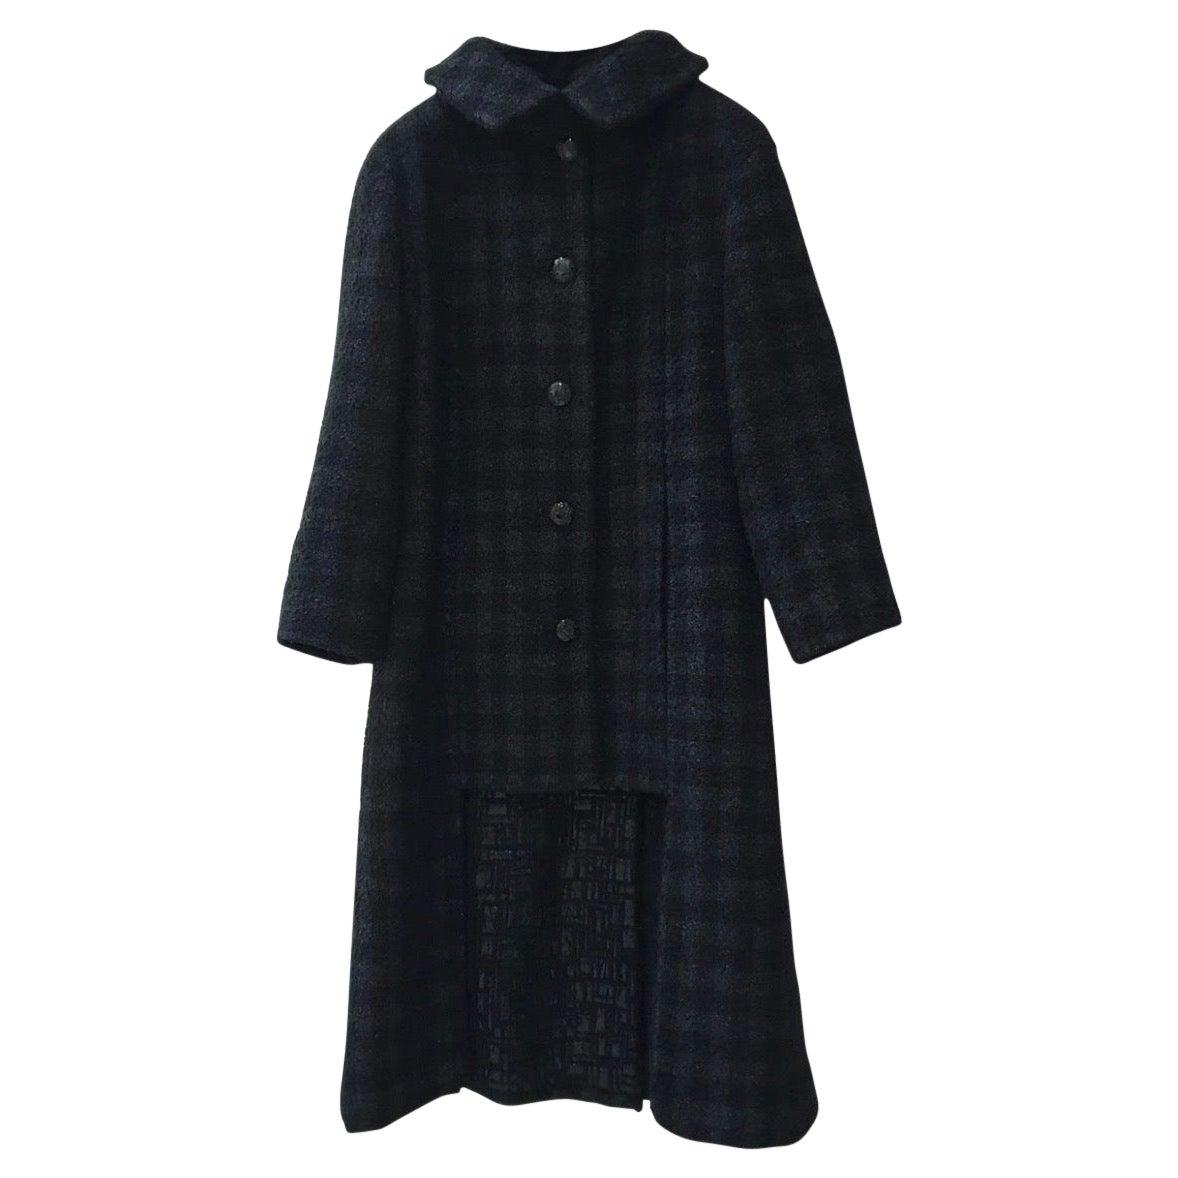 Chanel 2013 Tweed Coat